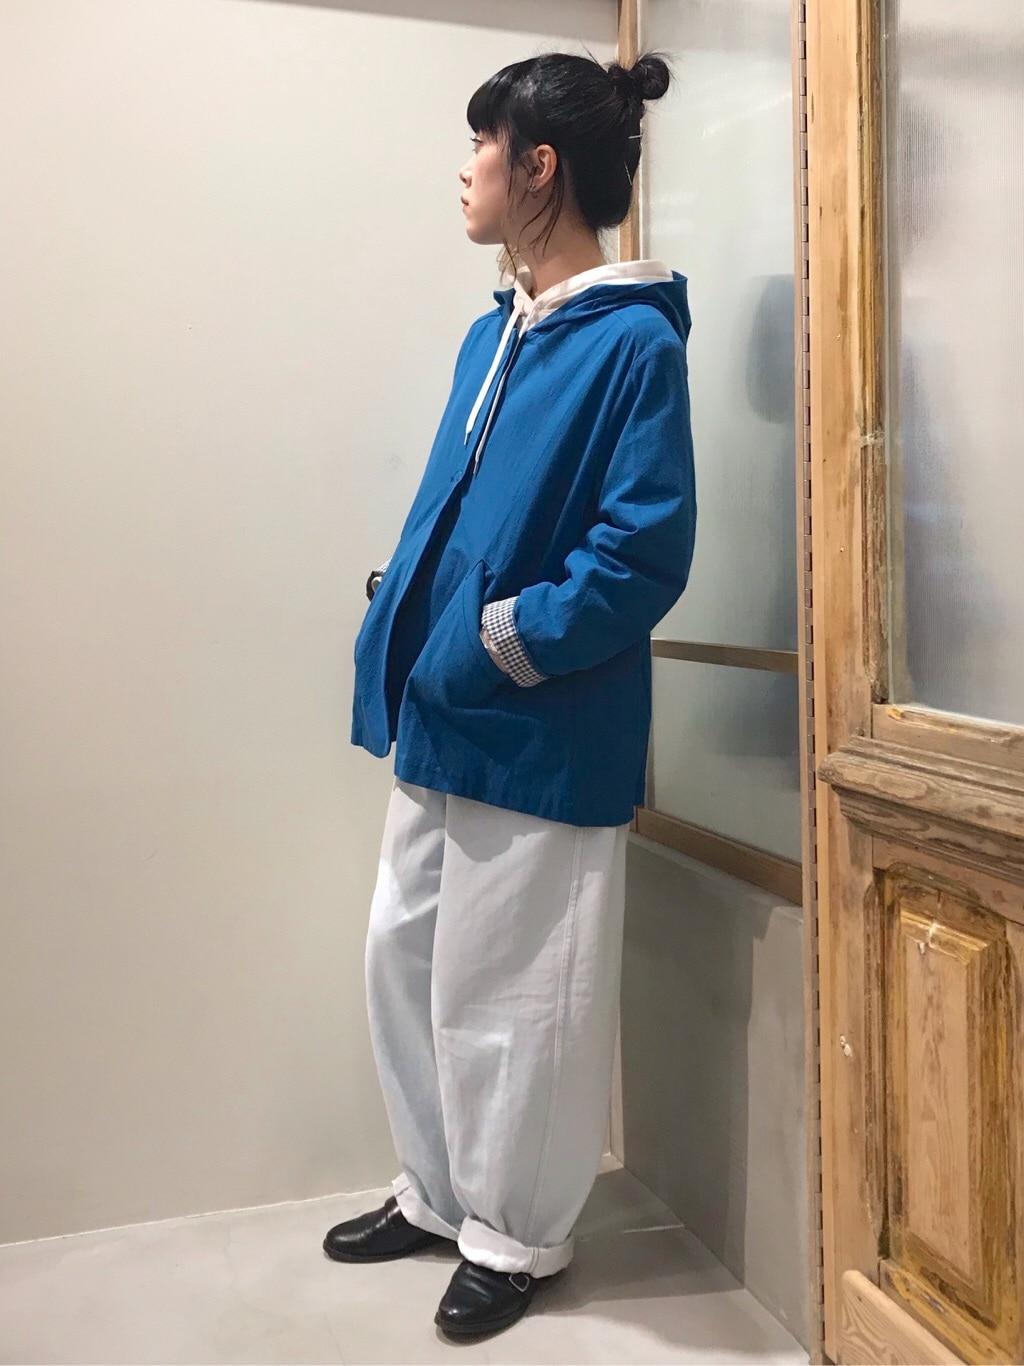 bulle de savon 渋谷スクランブルスクエア 身長:153cm 2020.03.12